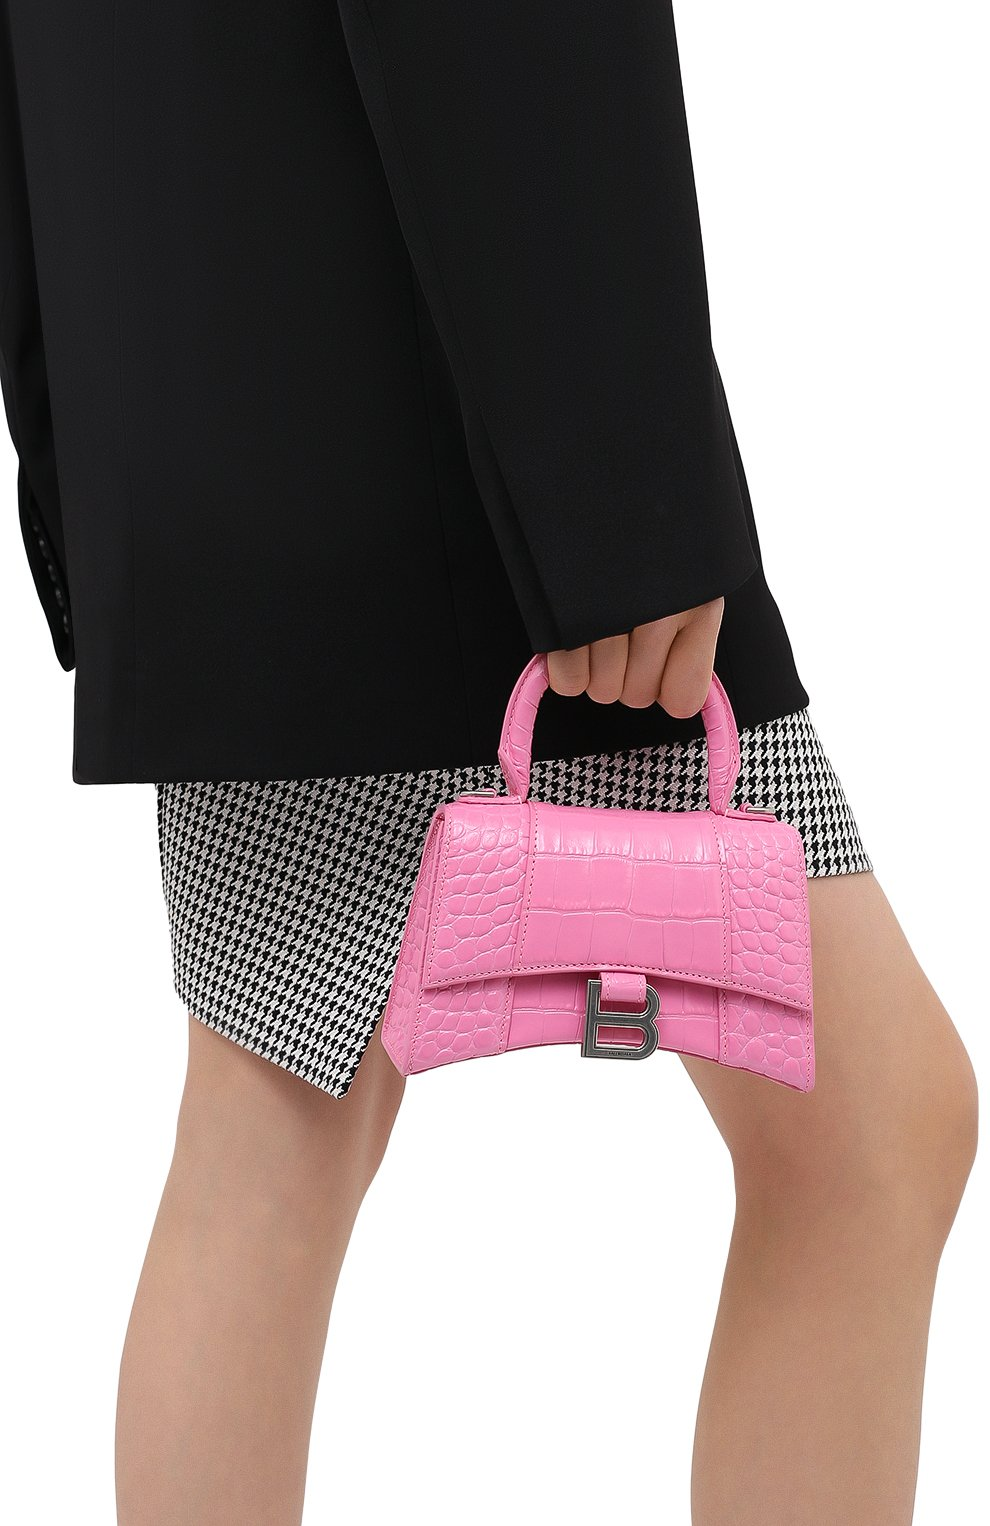 Женская сумка hourglass xs BALENCIAGA розового цвета, арт. 592833/1LR6Y   Фото 2 (Сумки-технические: Сумки через плечо, Сумки top-handle; Материал: Натуральная кожа; Размер: mini; Ремень/цепочка: На ремешке)